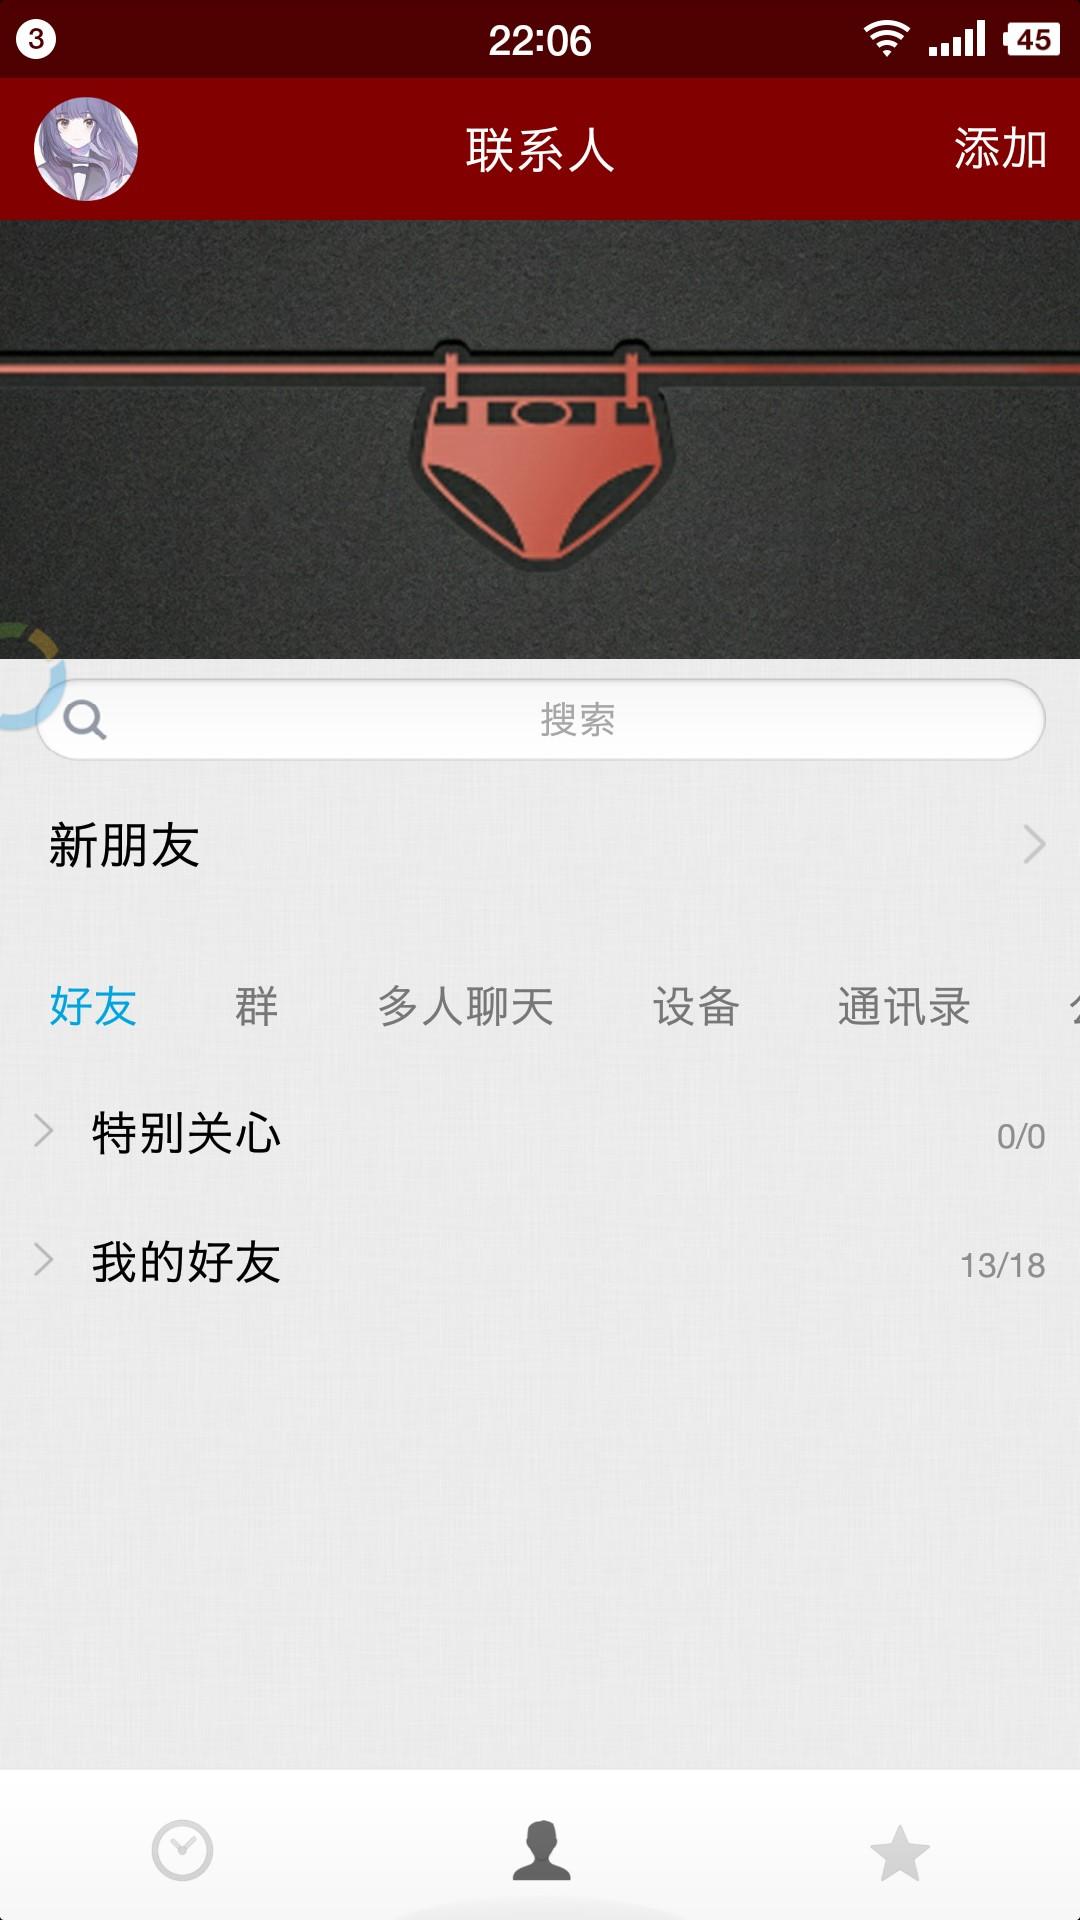 Screenshot_2017-10-27-22-06-31-669_QQ.png